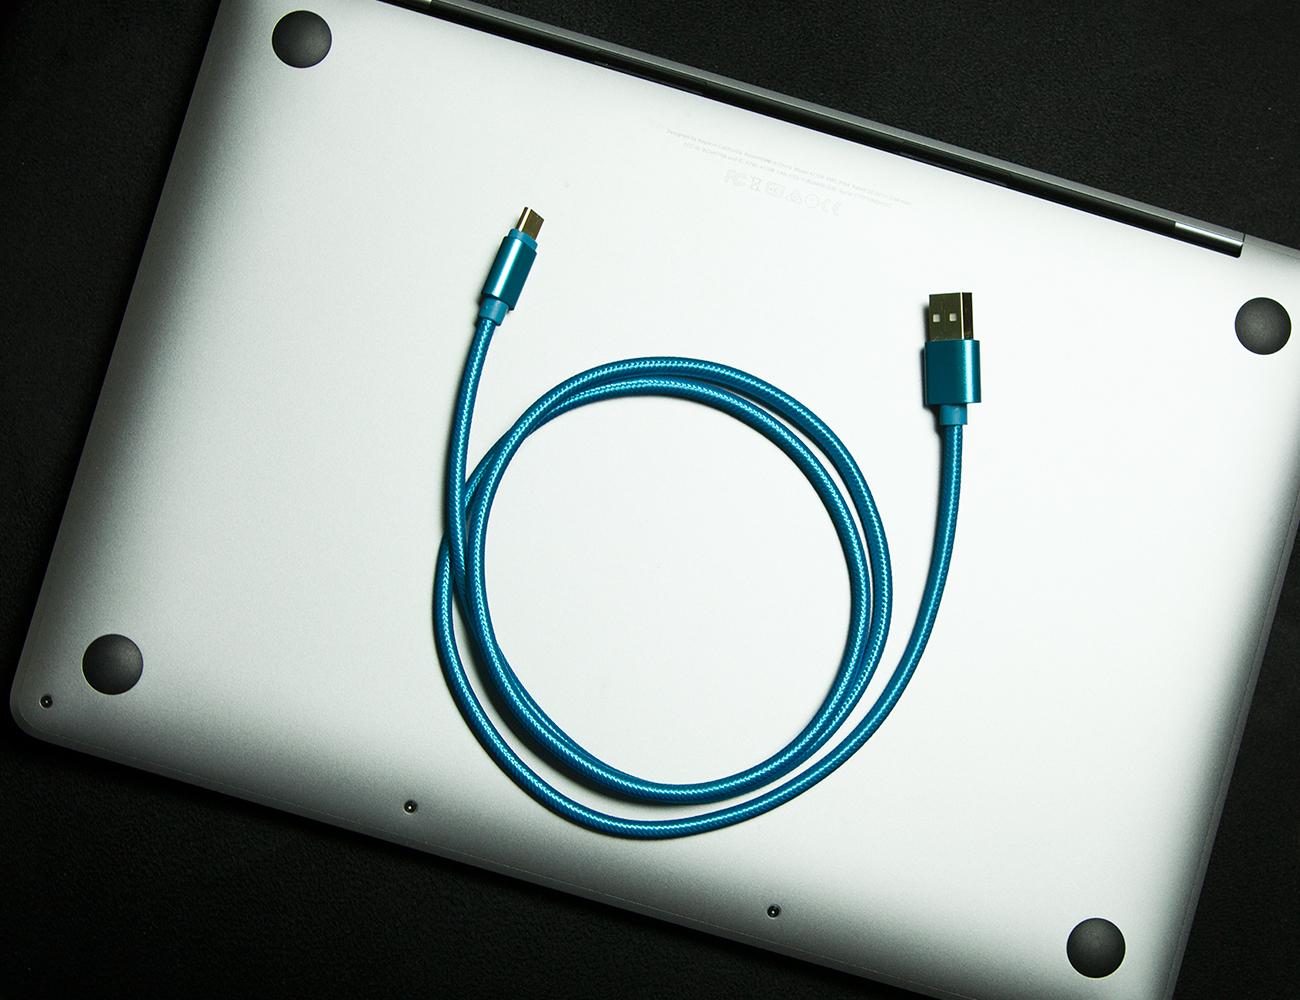 AmpTough Ultra Strong USB-C Cable